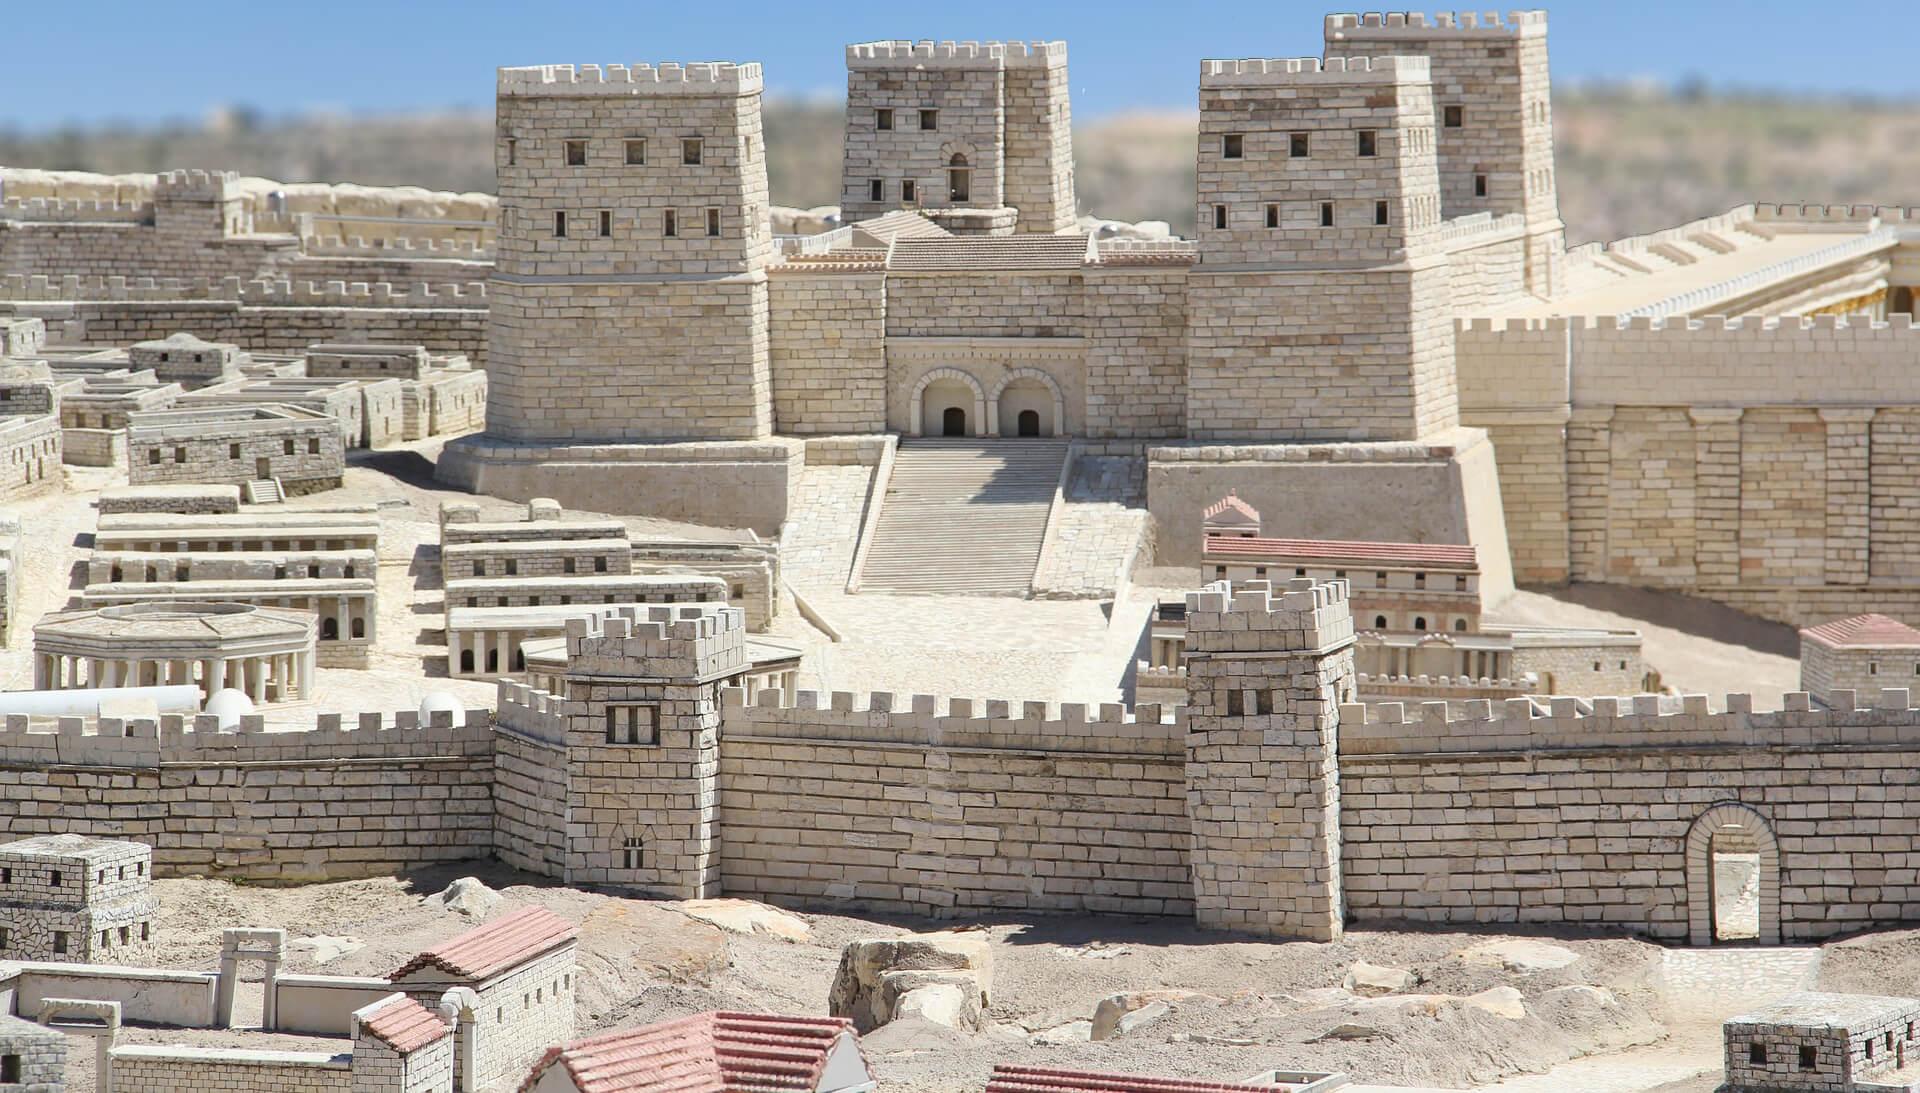 Monday, March 22 — Compass Reading: Steering Toward Jerusalem